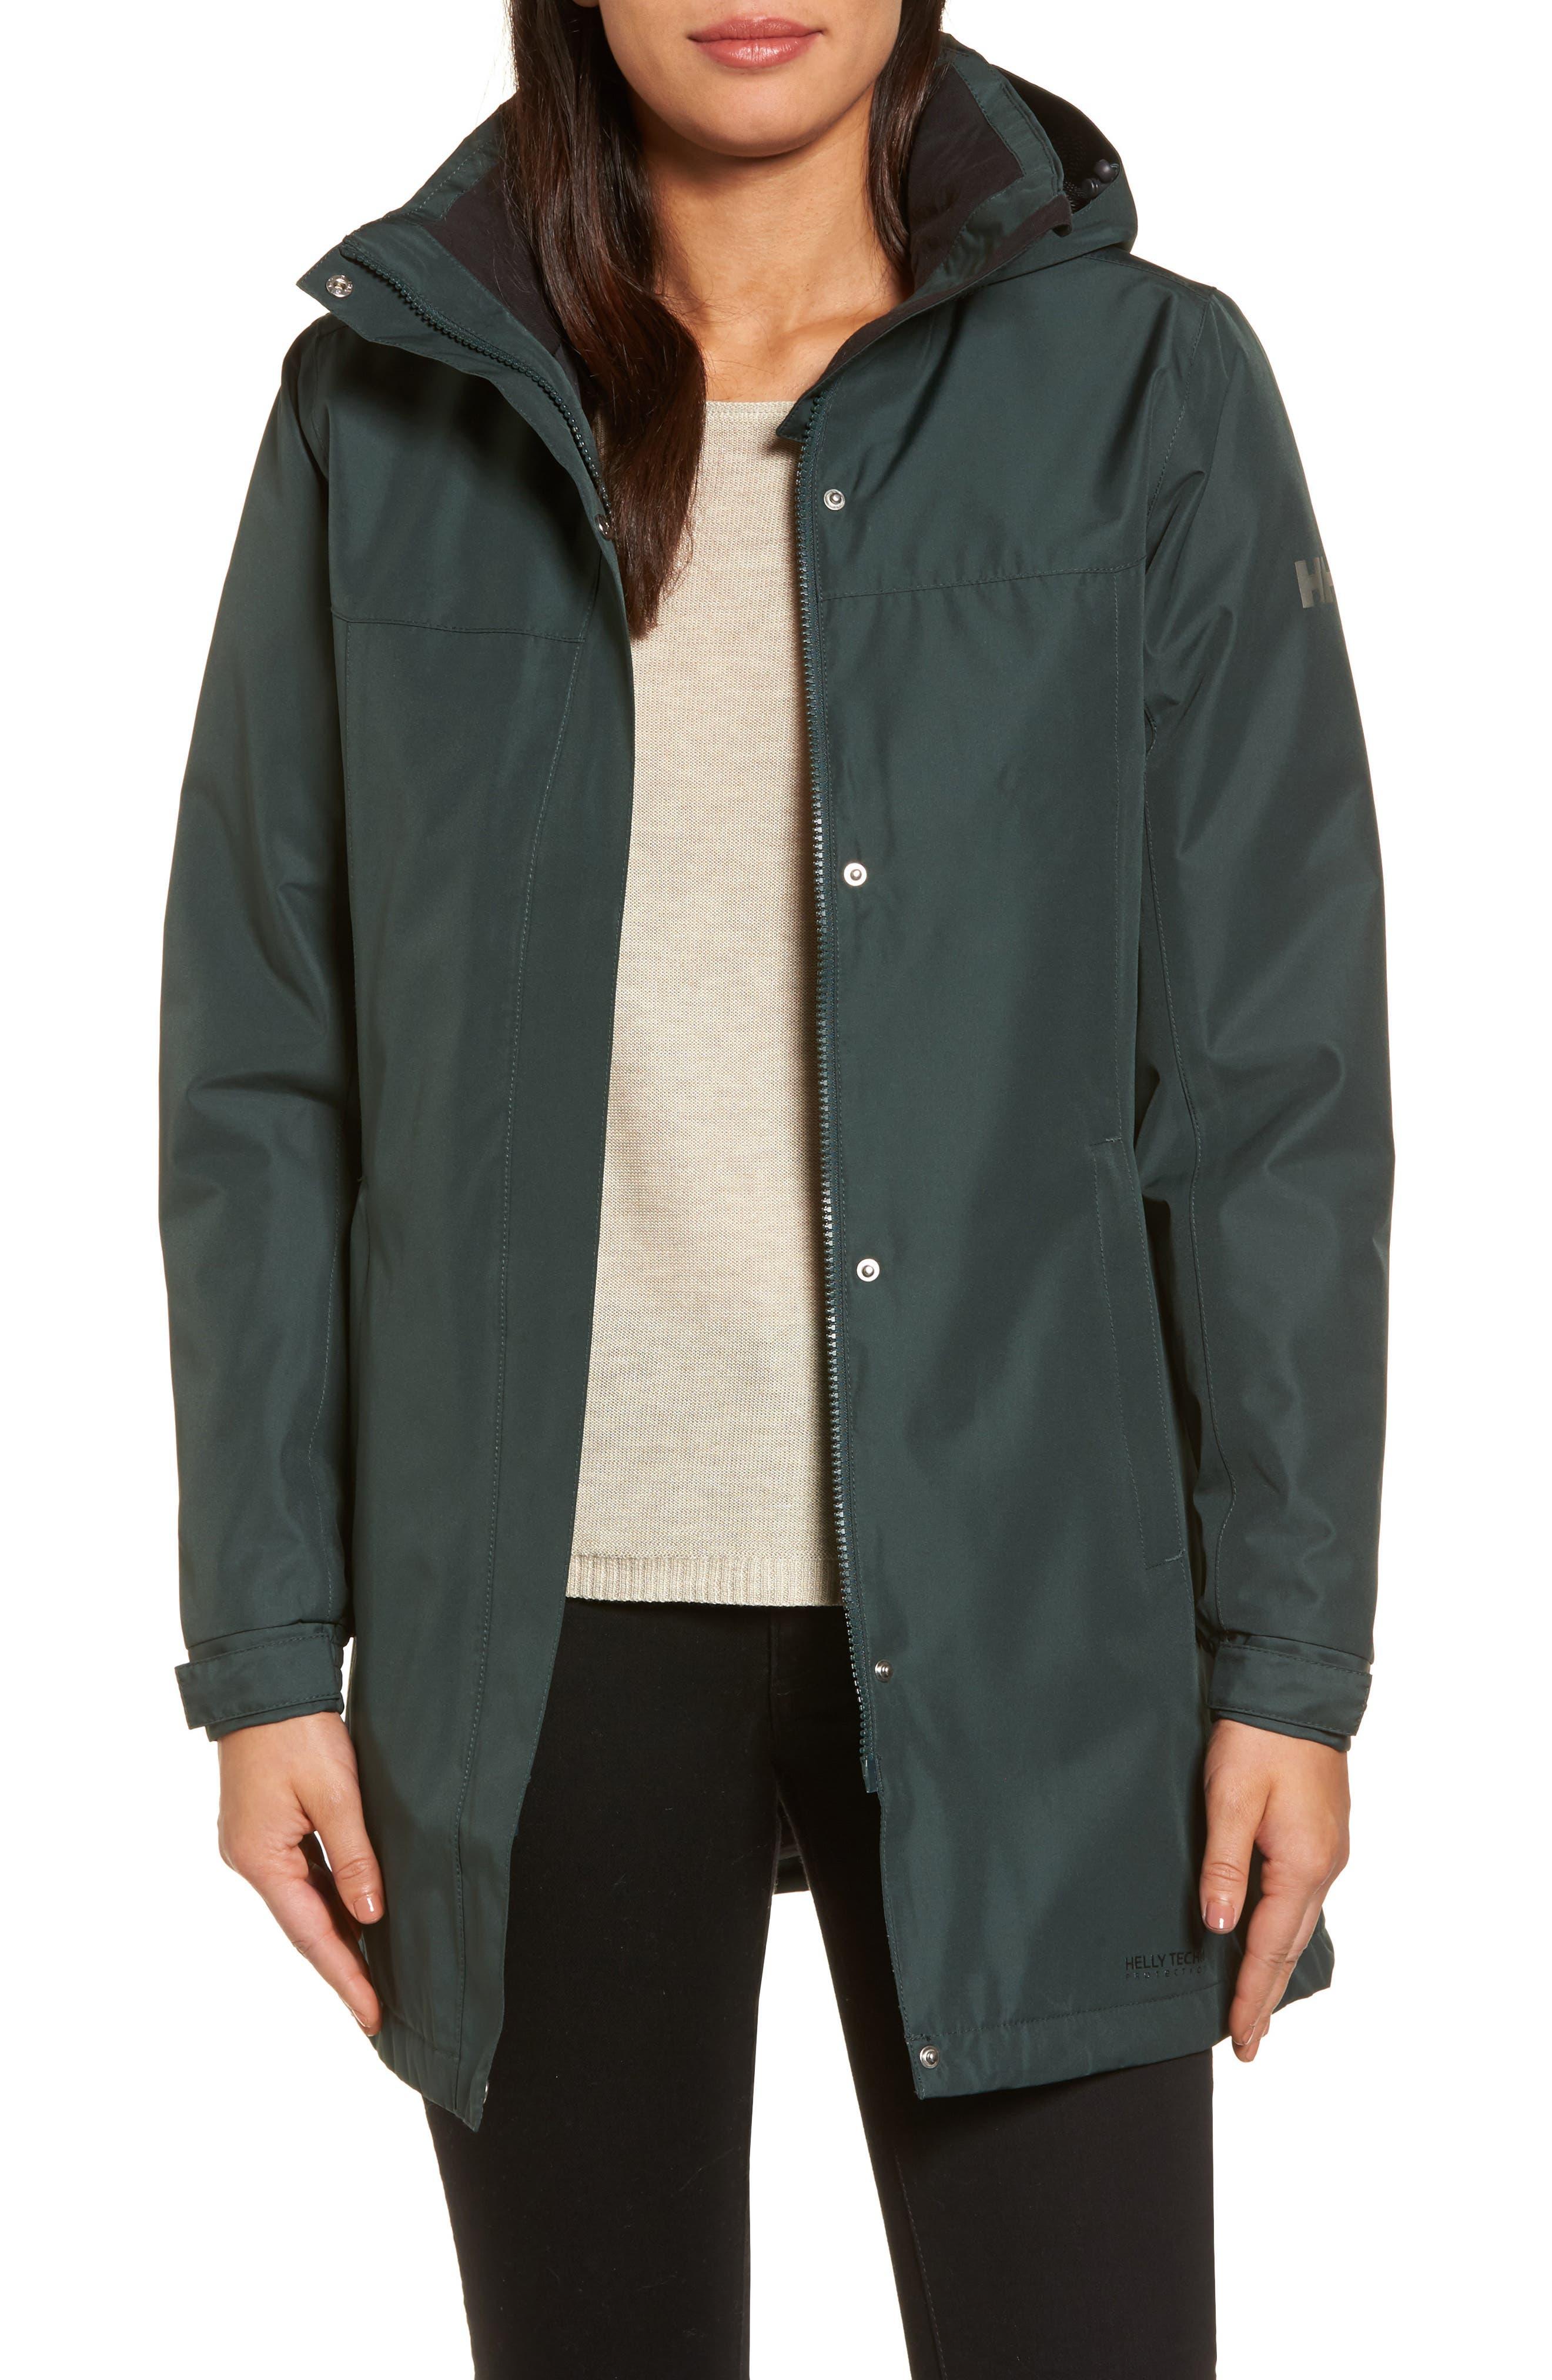 Alternate Image 1 Selected - Helly Hansen Aden Hooded Insulated Rain Jacket